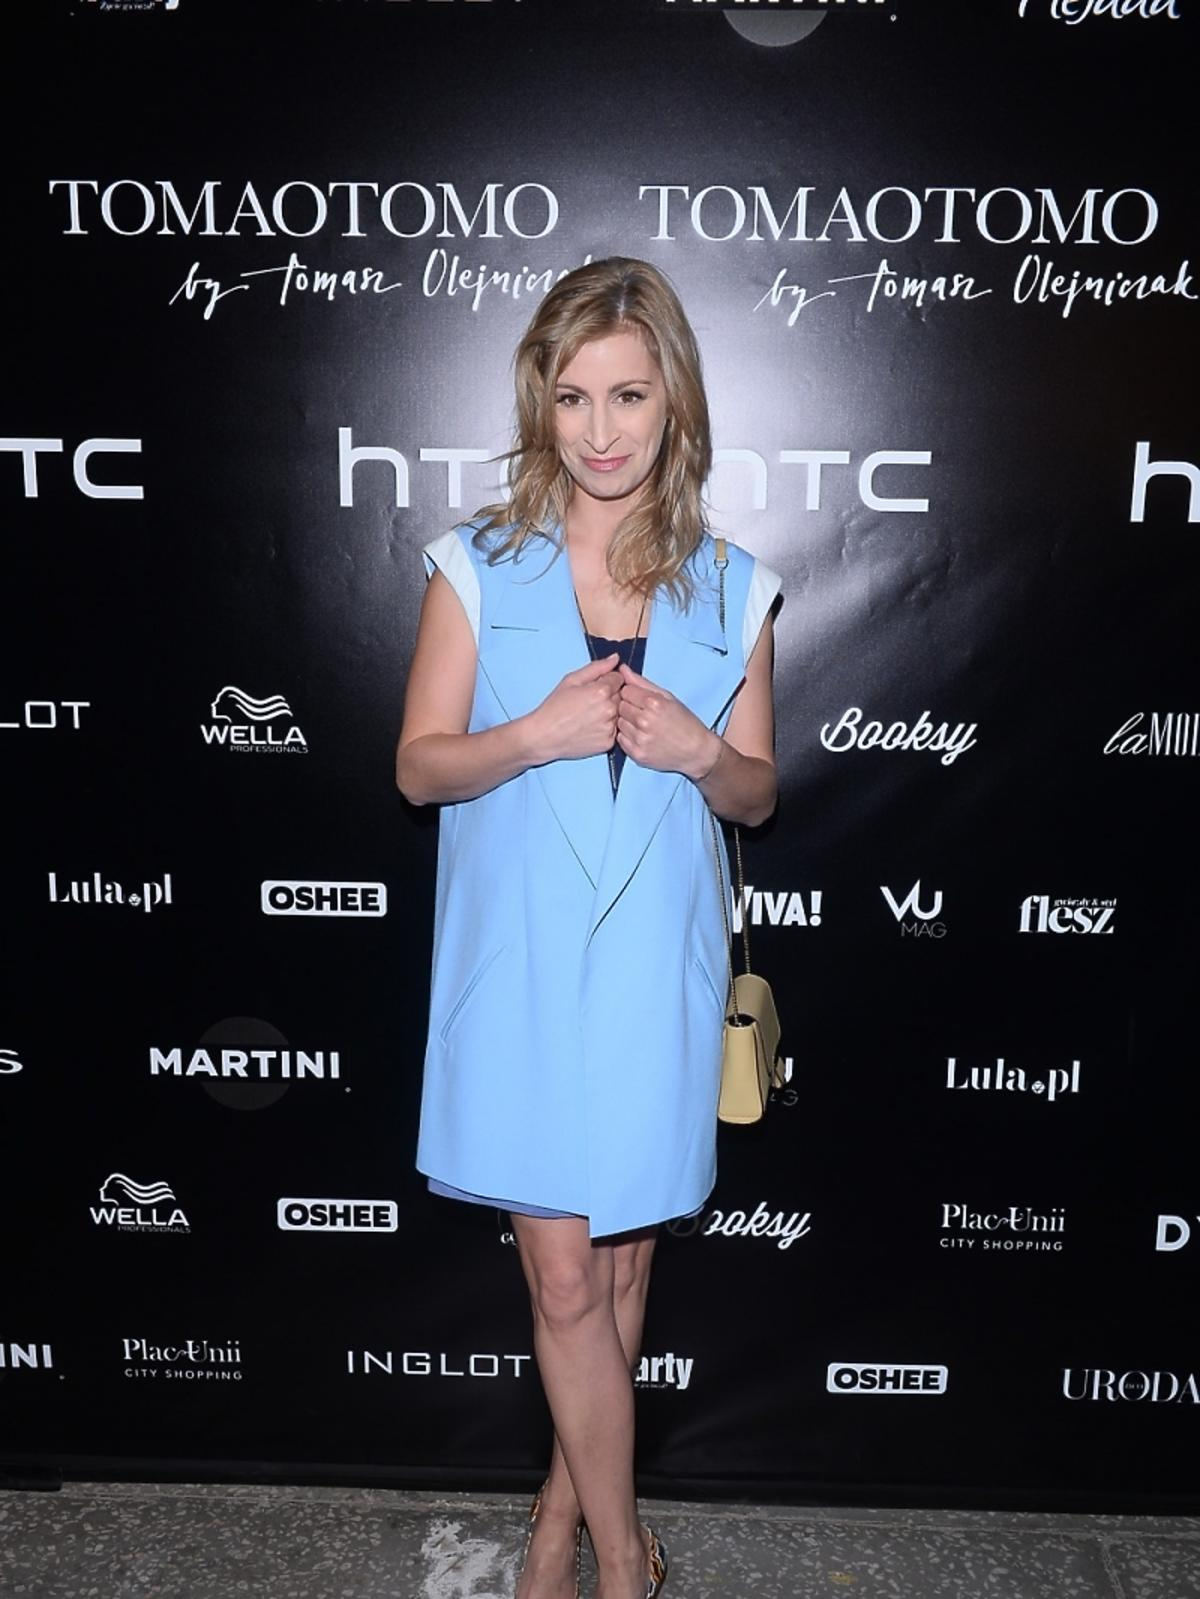 Magdalena Schejba na pokazie Tomaotomo